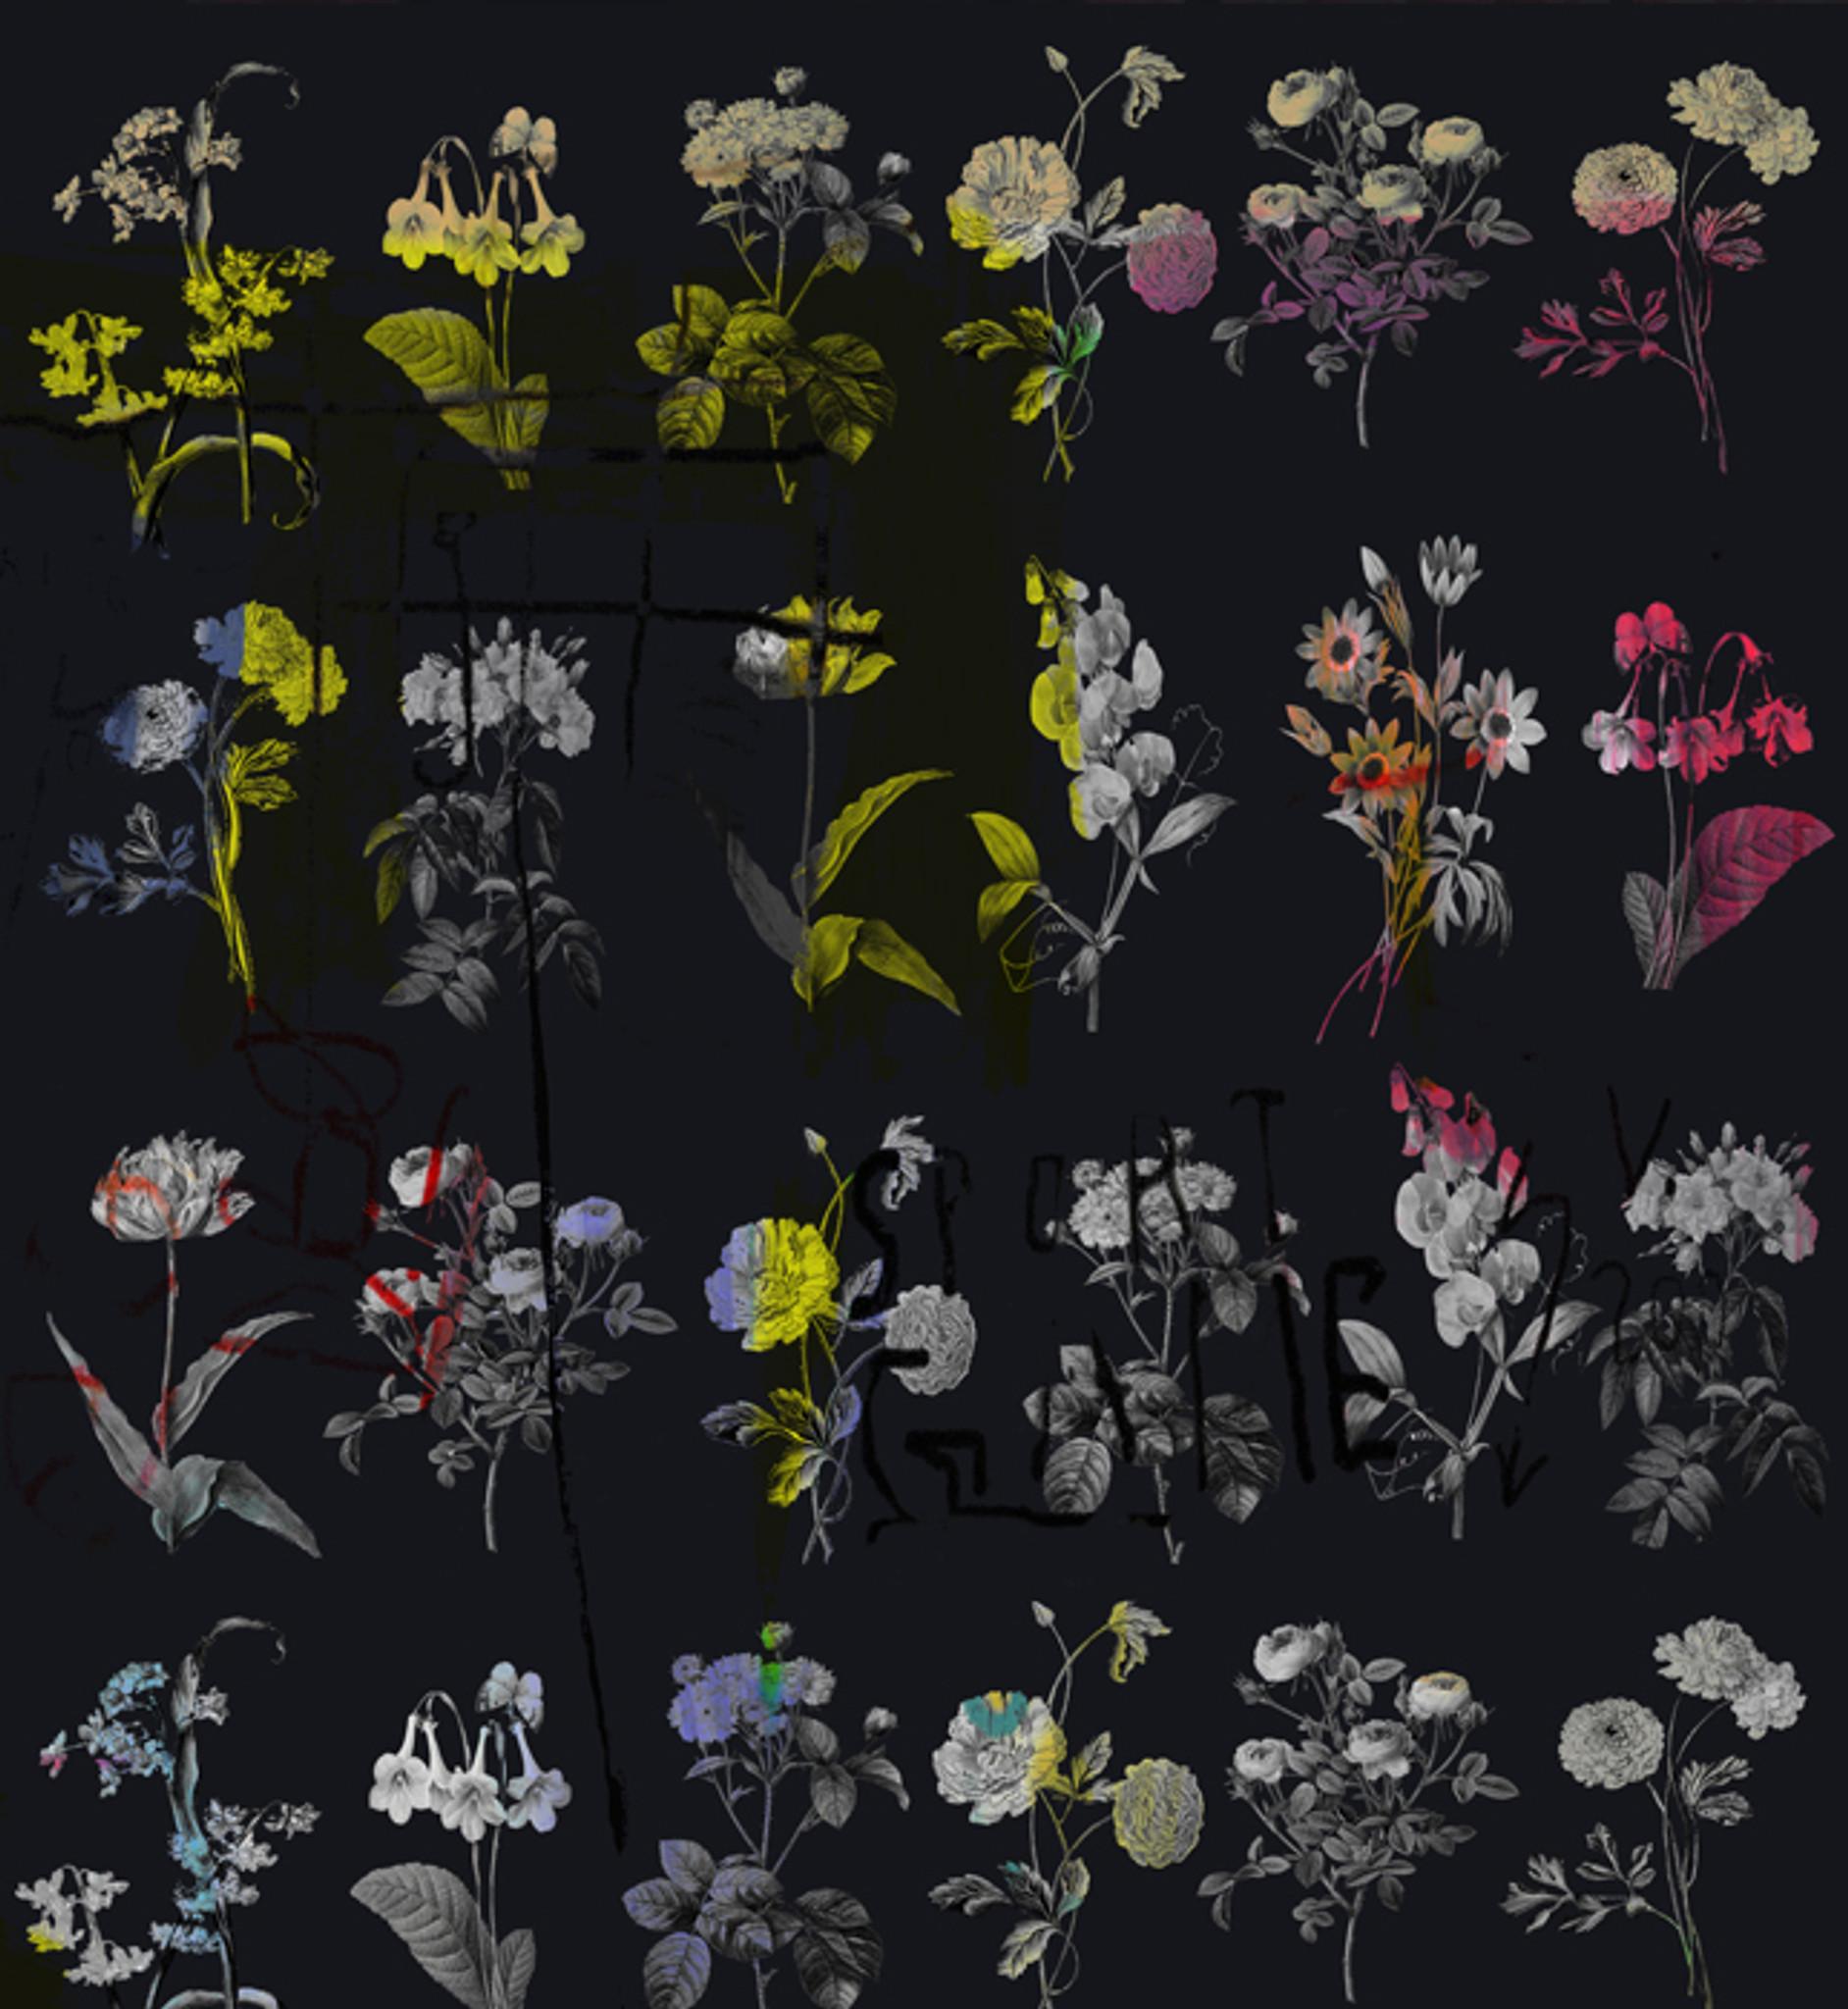 Fabric - Chiaroscuro - Black Magic